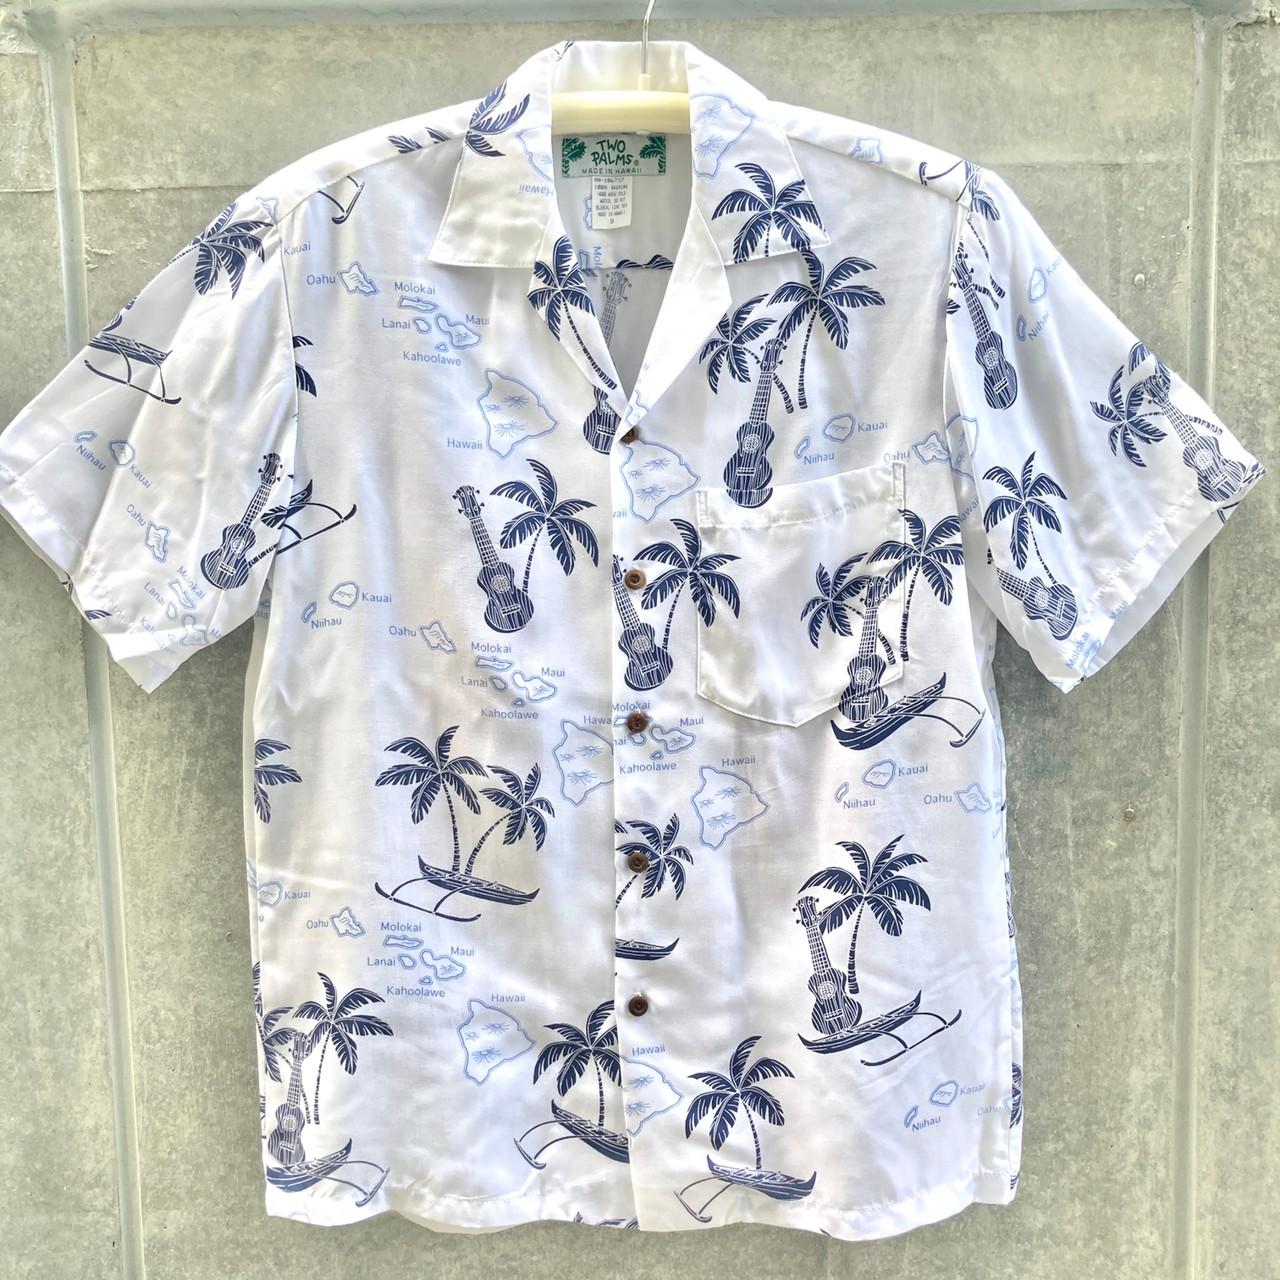 Mensアロハシャツ/Islands/ White・Cream・Navy